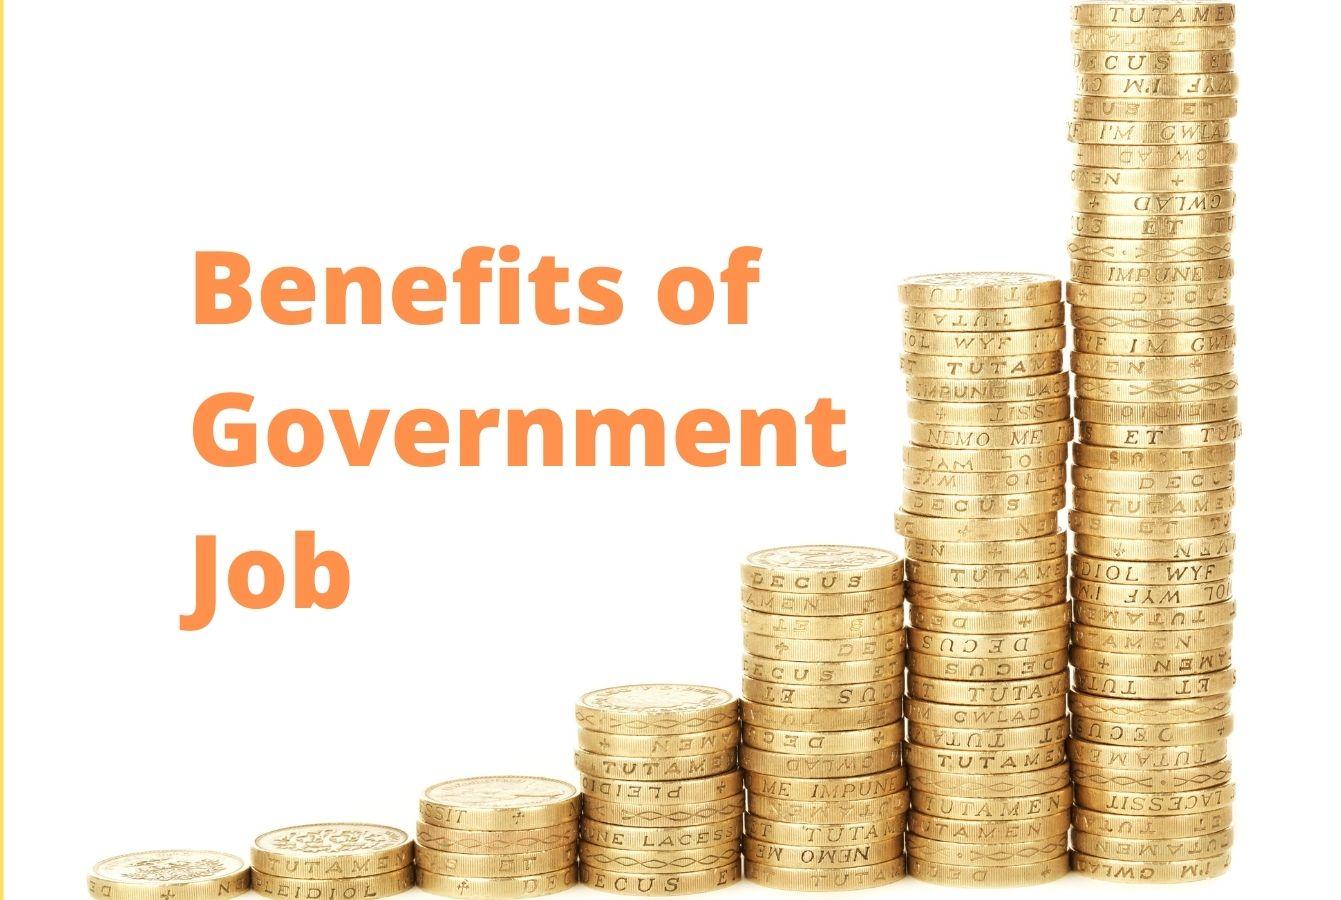 Benefits of Government Job